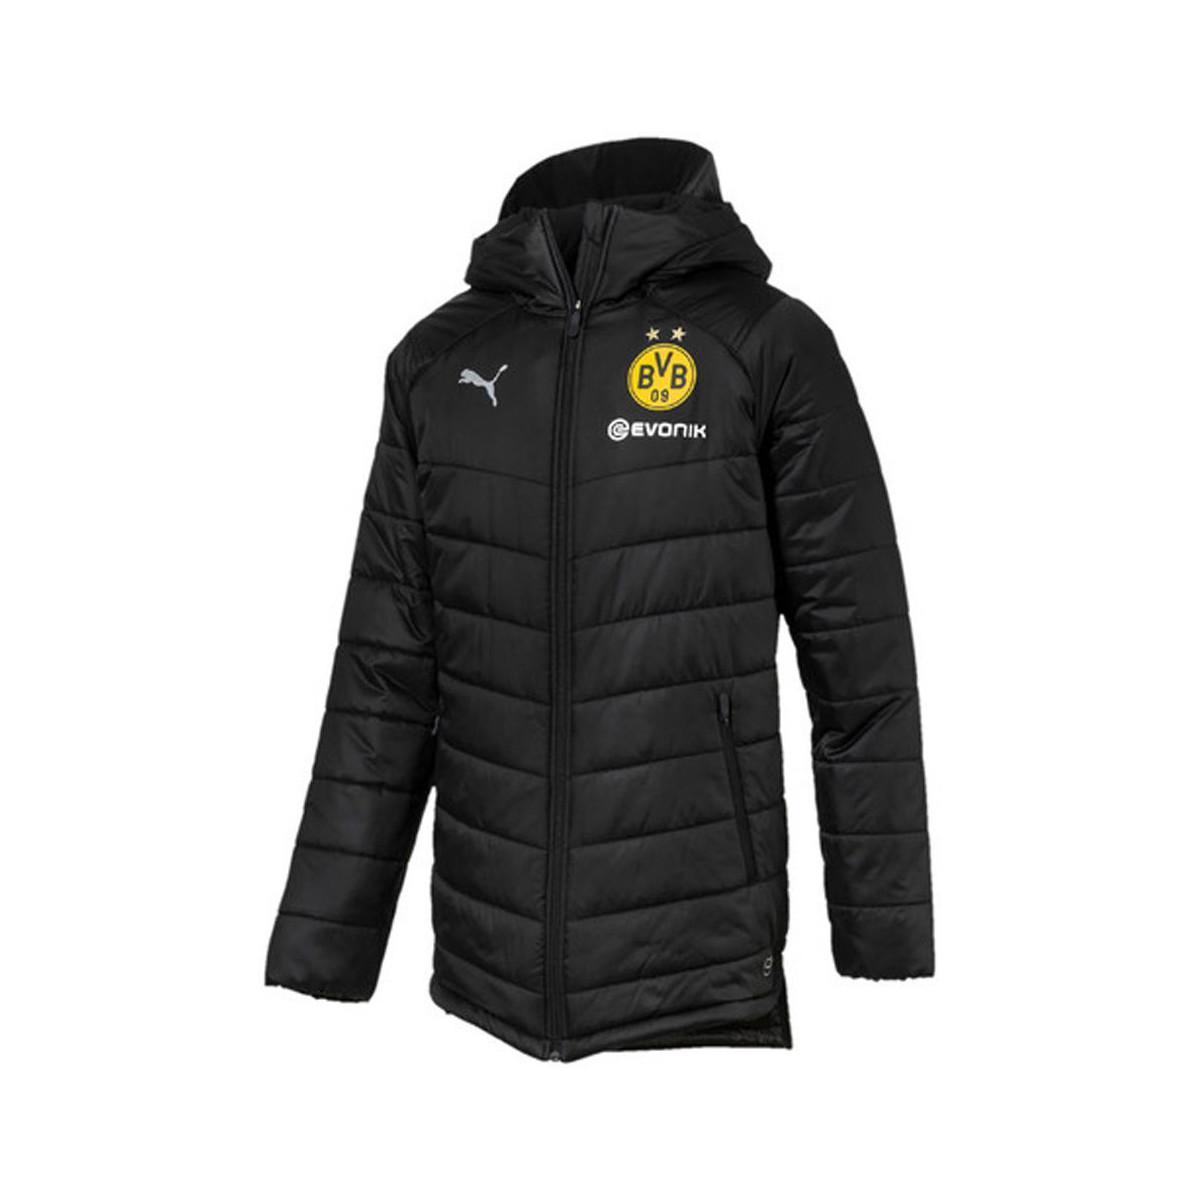 b7b8d3f209ec PUMA 2018-2019 Borussia Dortmund Bench Jacket Men s Jacket In Black ...